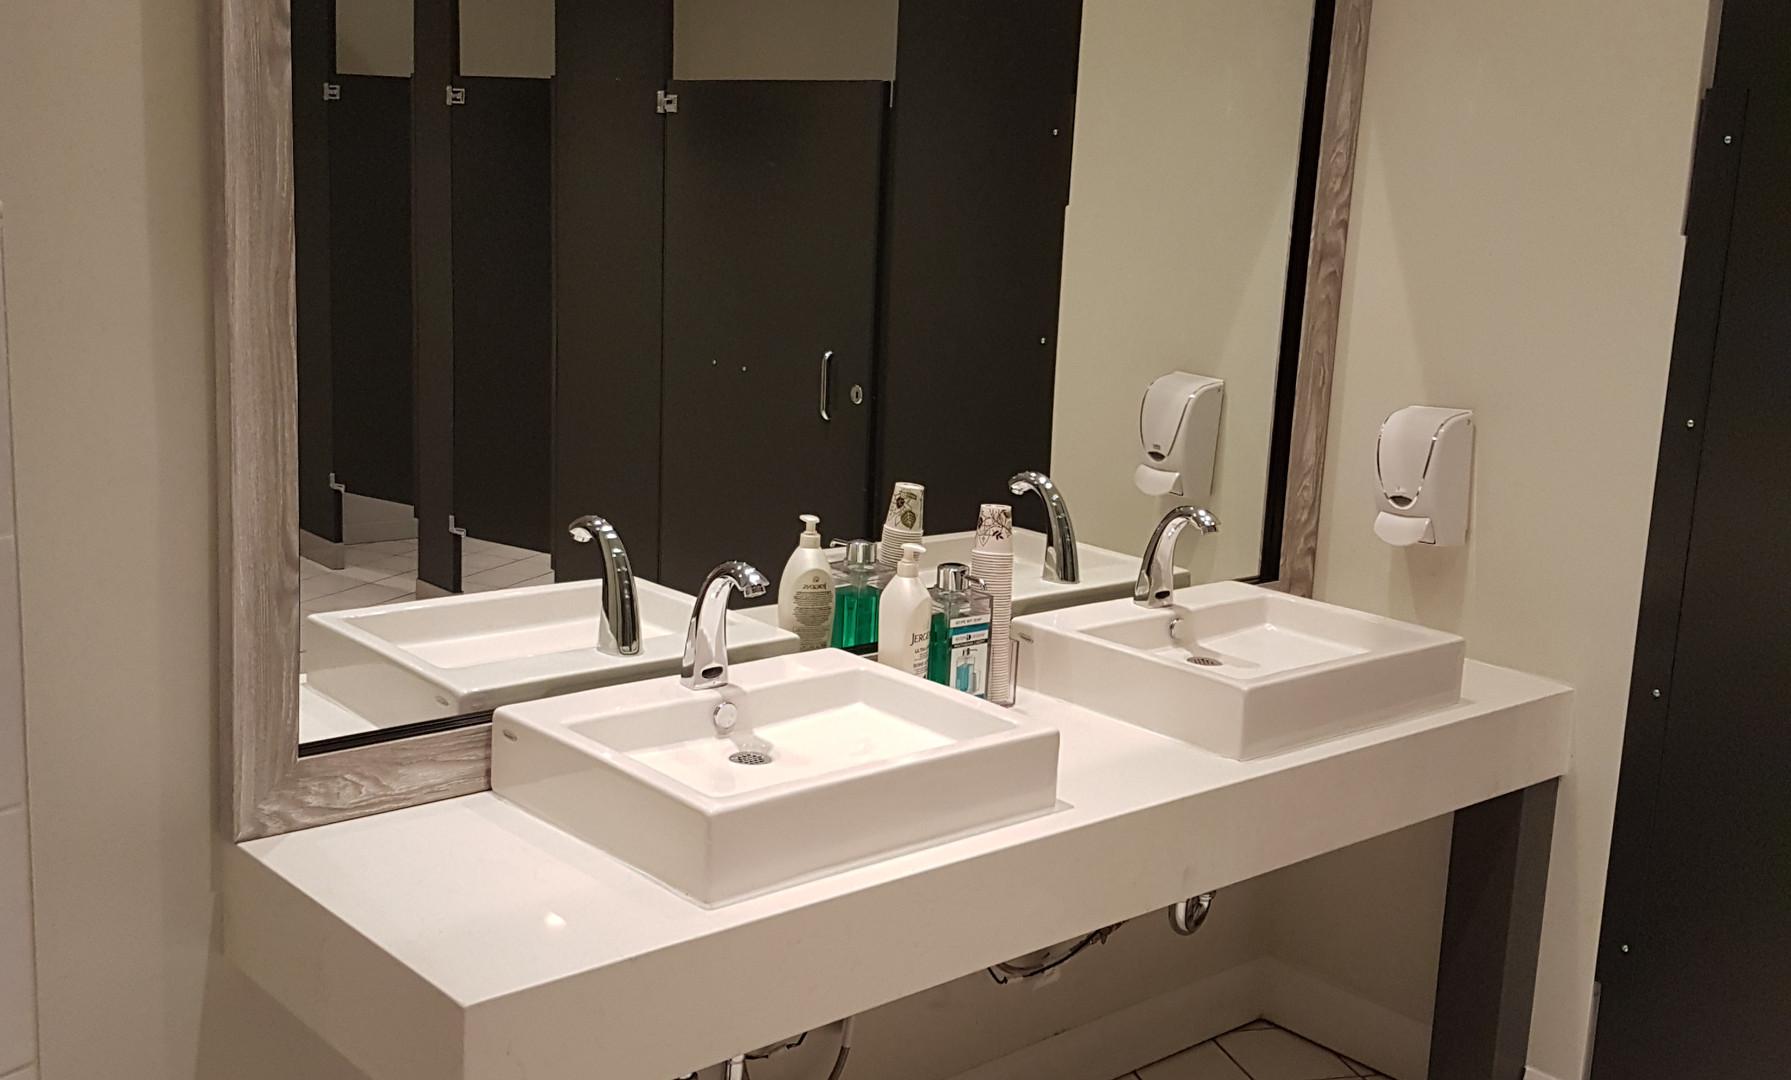 Office Washroom Updates